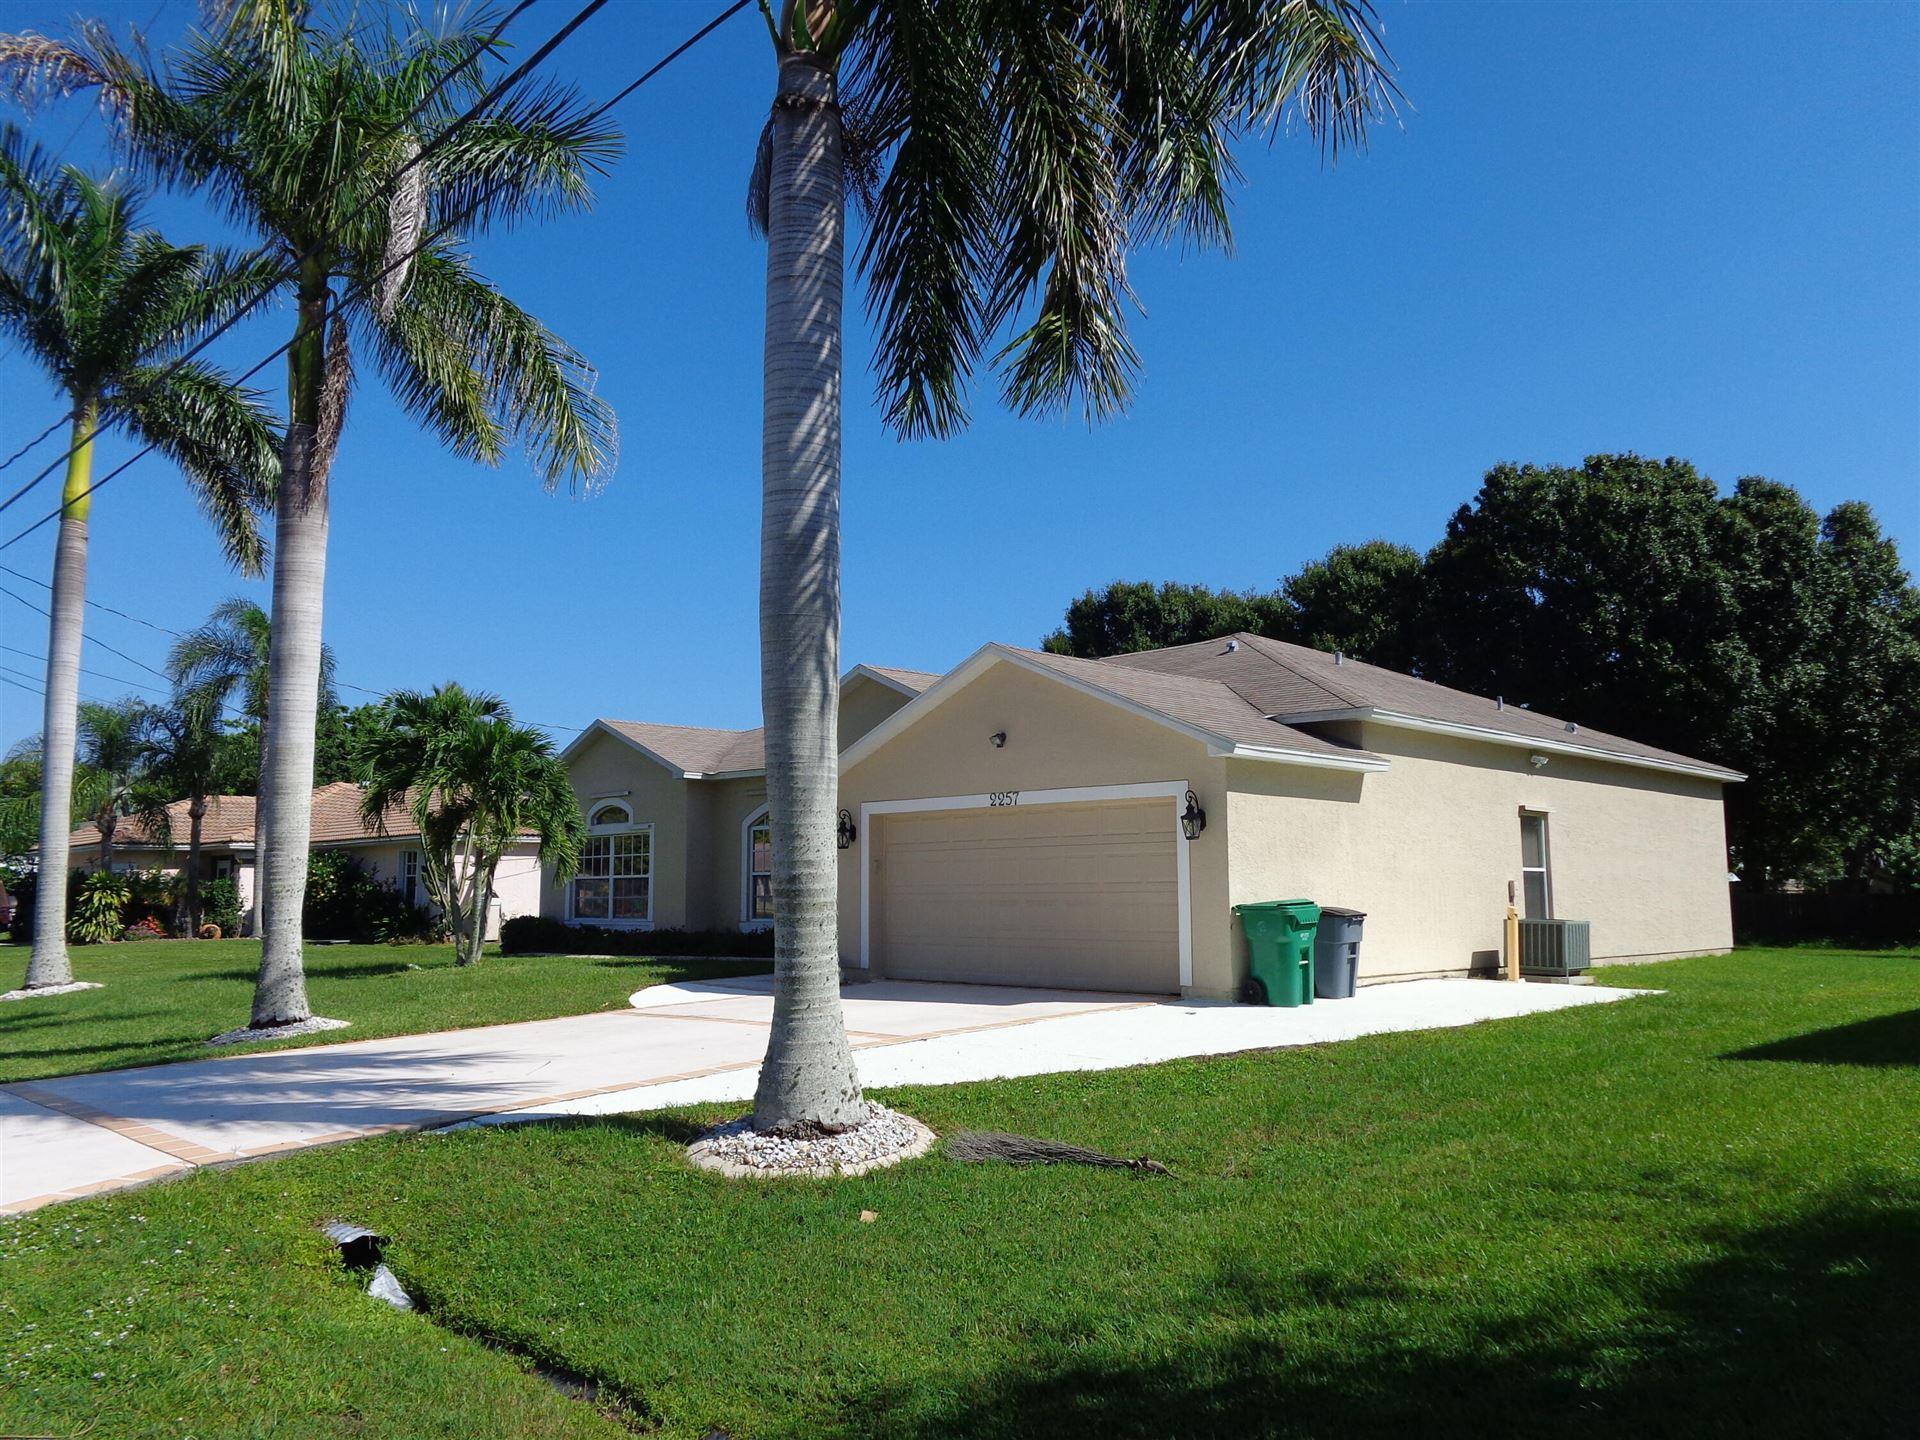 2257 SE Baron Street, Port Saint Lucie, FL 34952 - MLS#: RX-10751455